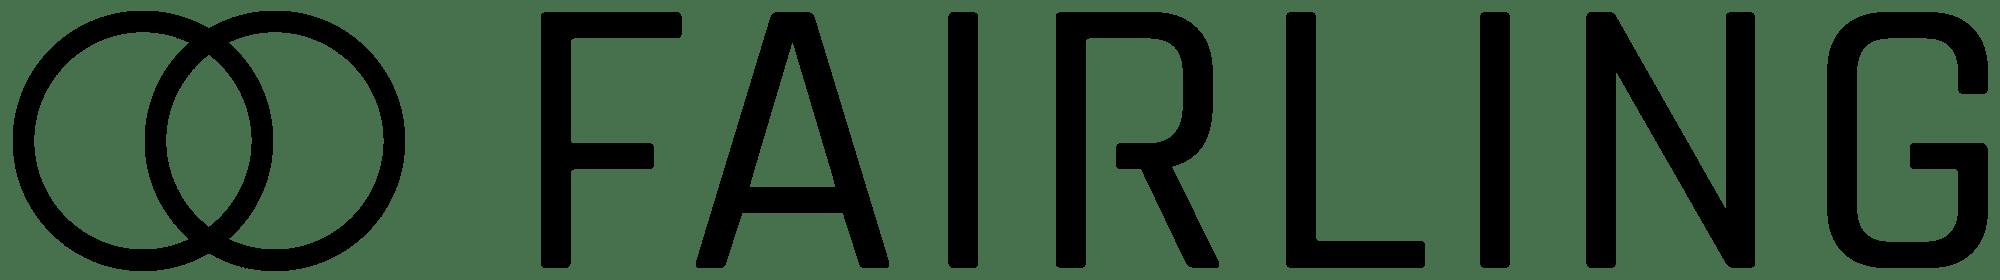 Apply Fairling.com